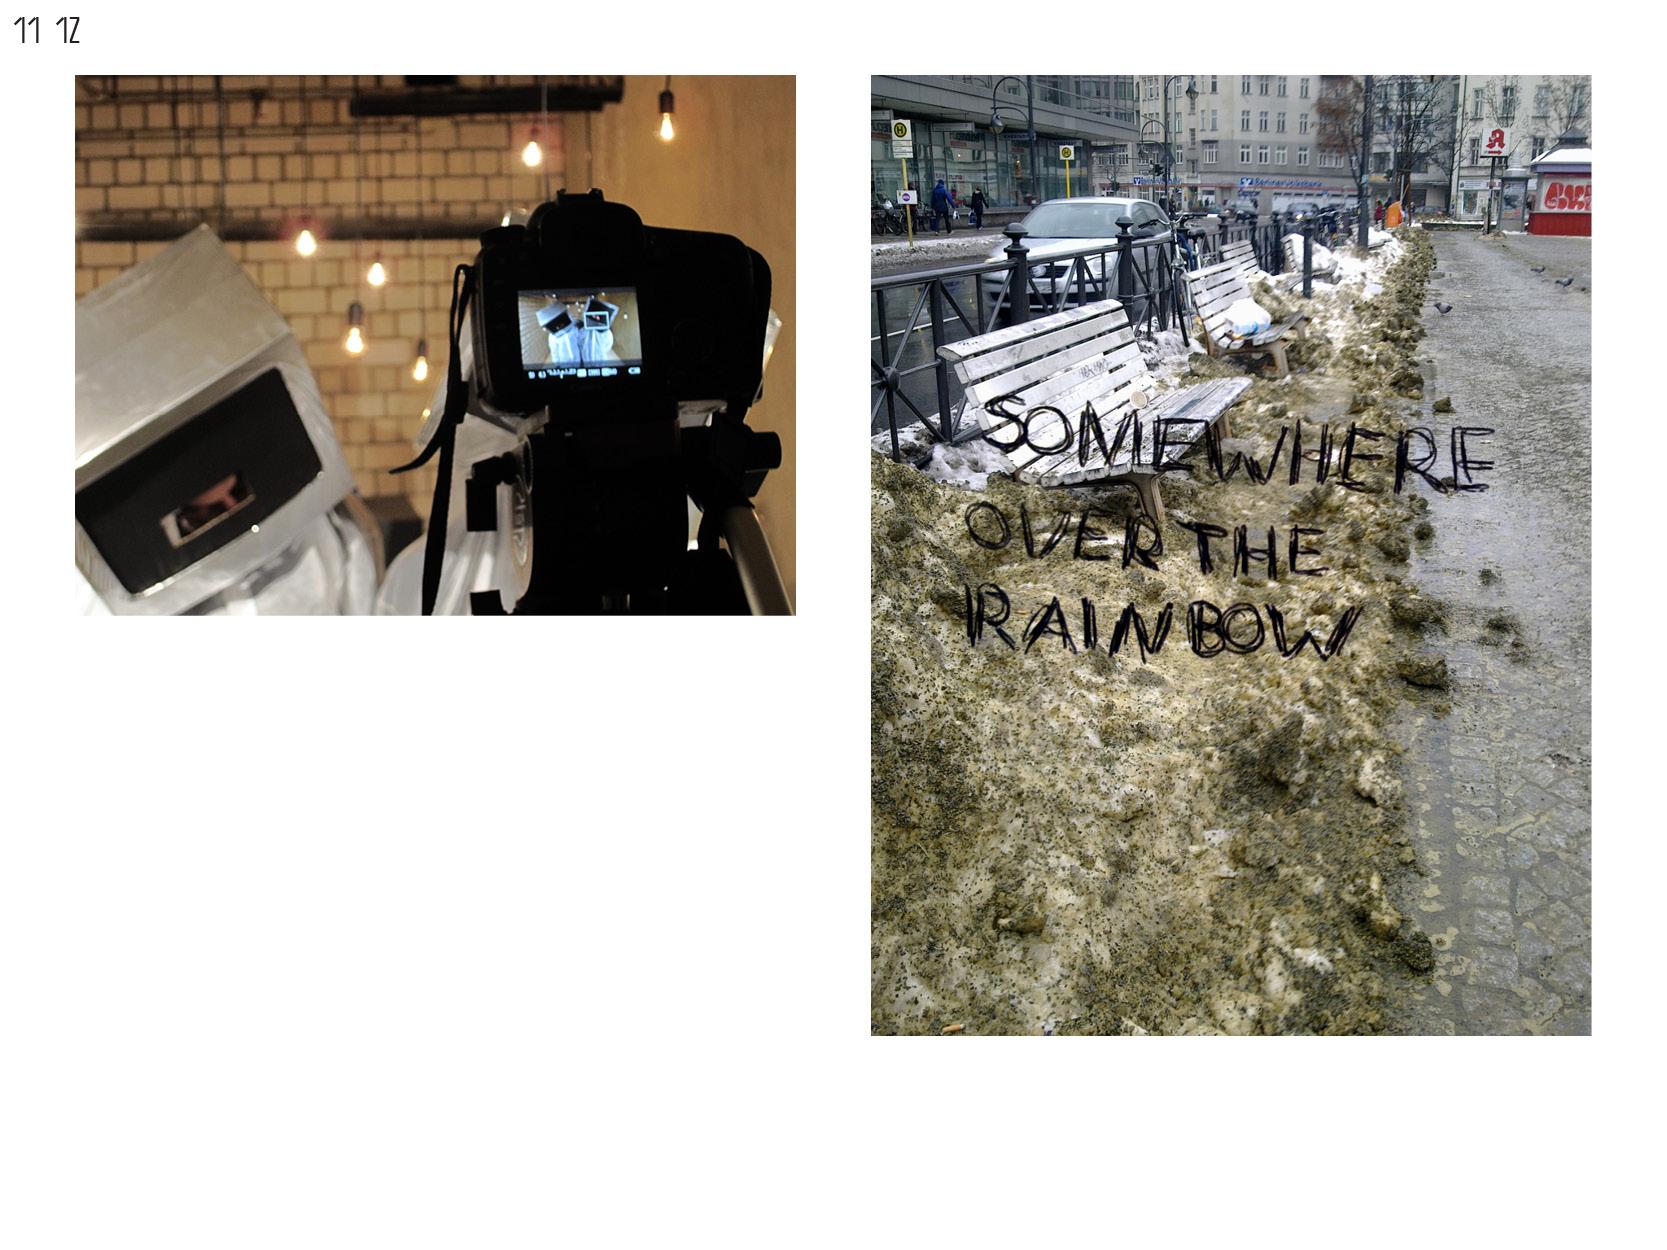 Gerrit-Schweiger-Dialog-Städte-Paris-Berlin-Jessica-Blank-Experiment-Fotoserie-Tagebuch-visuelle-Kommunikation-52